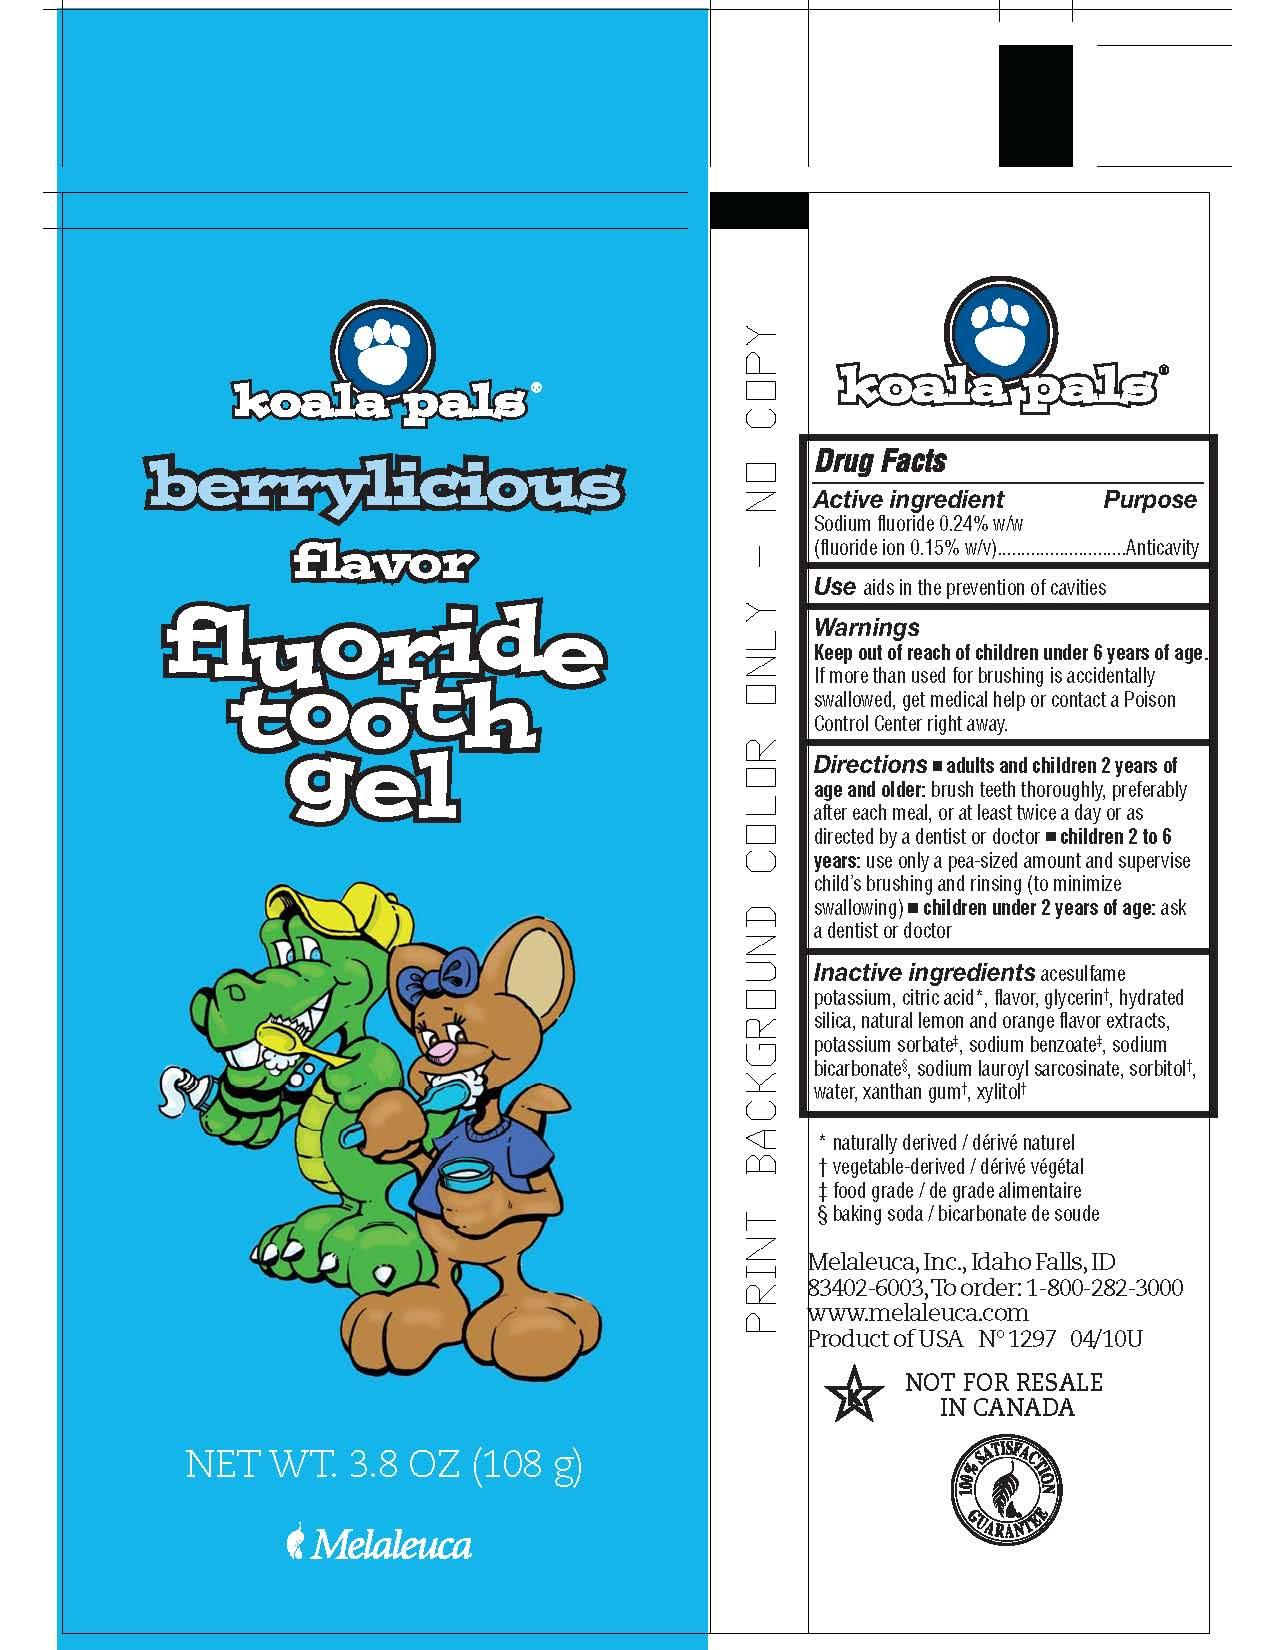 Koala Pals Berrylicious (Sodium Fluoride) Paste, Dentifrice [Melaleuca, Inc.]